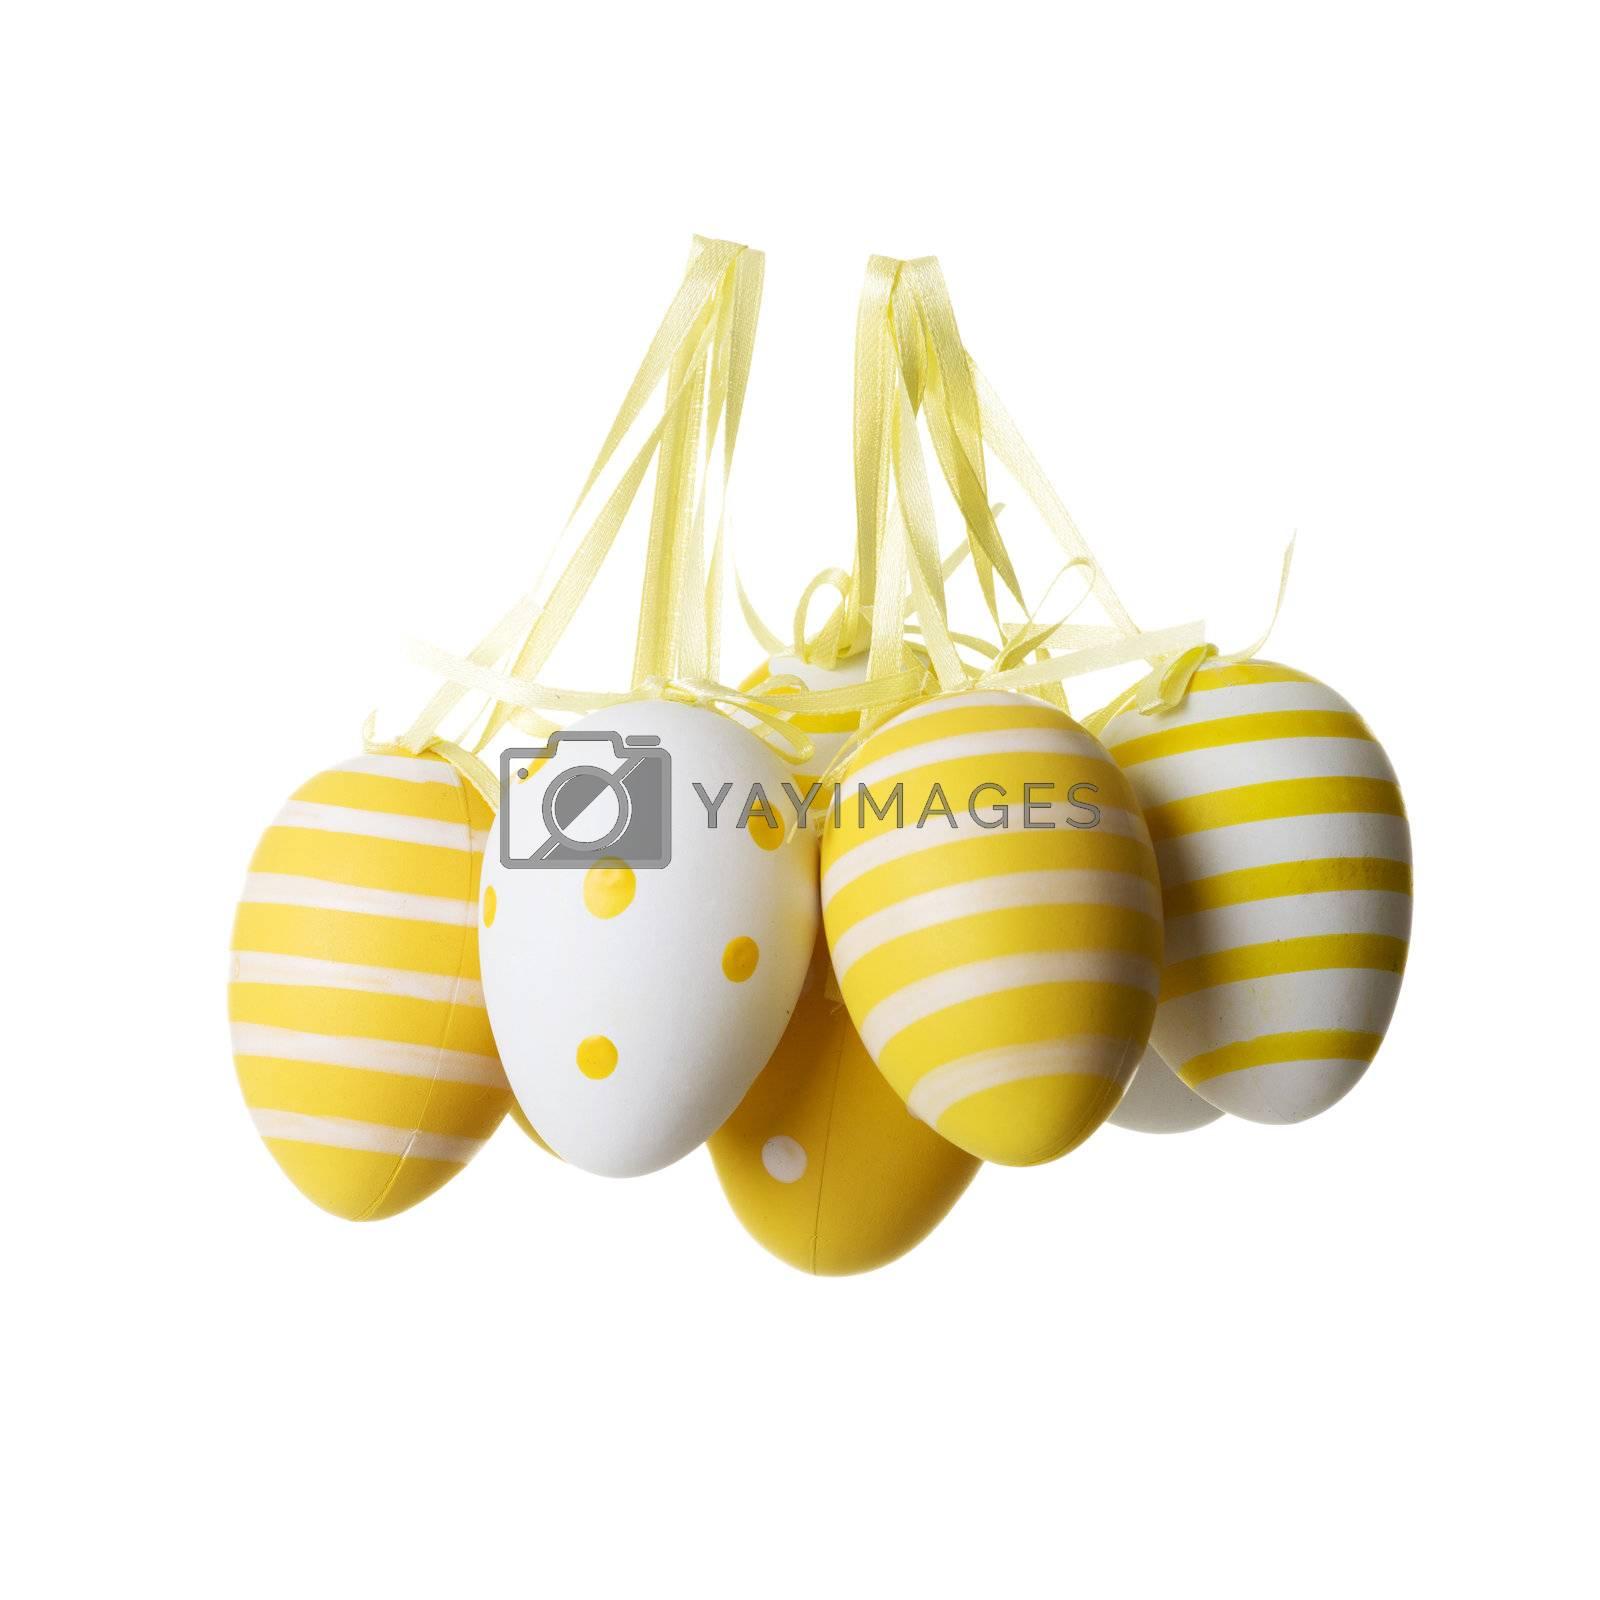 Easter egg decoration, isolated on white